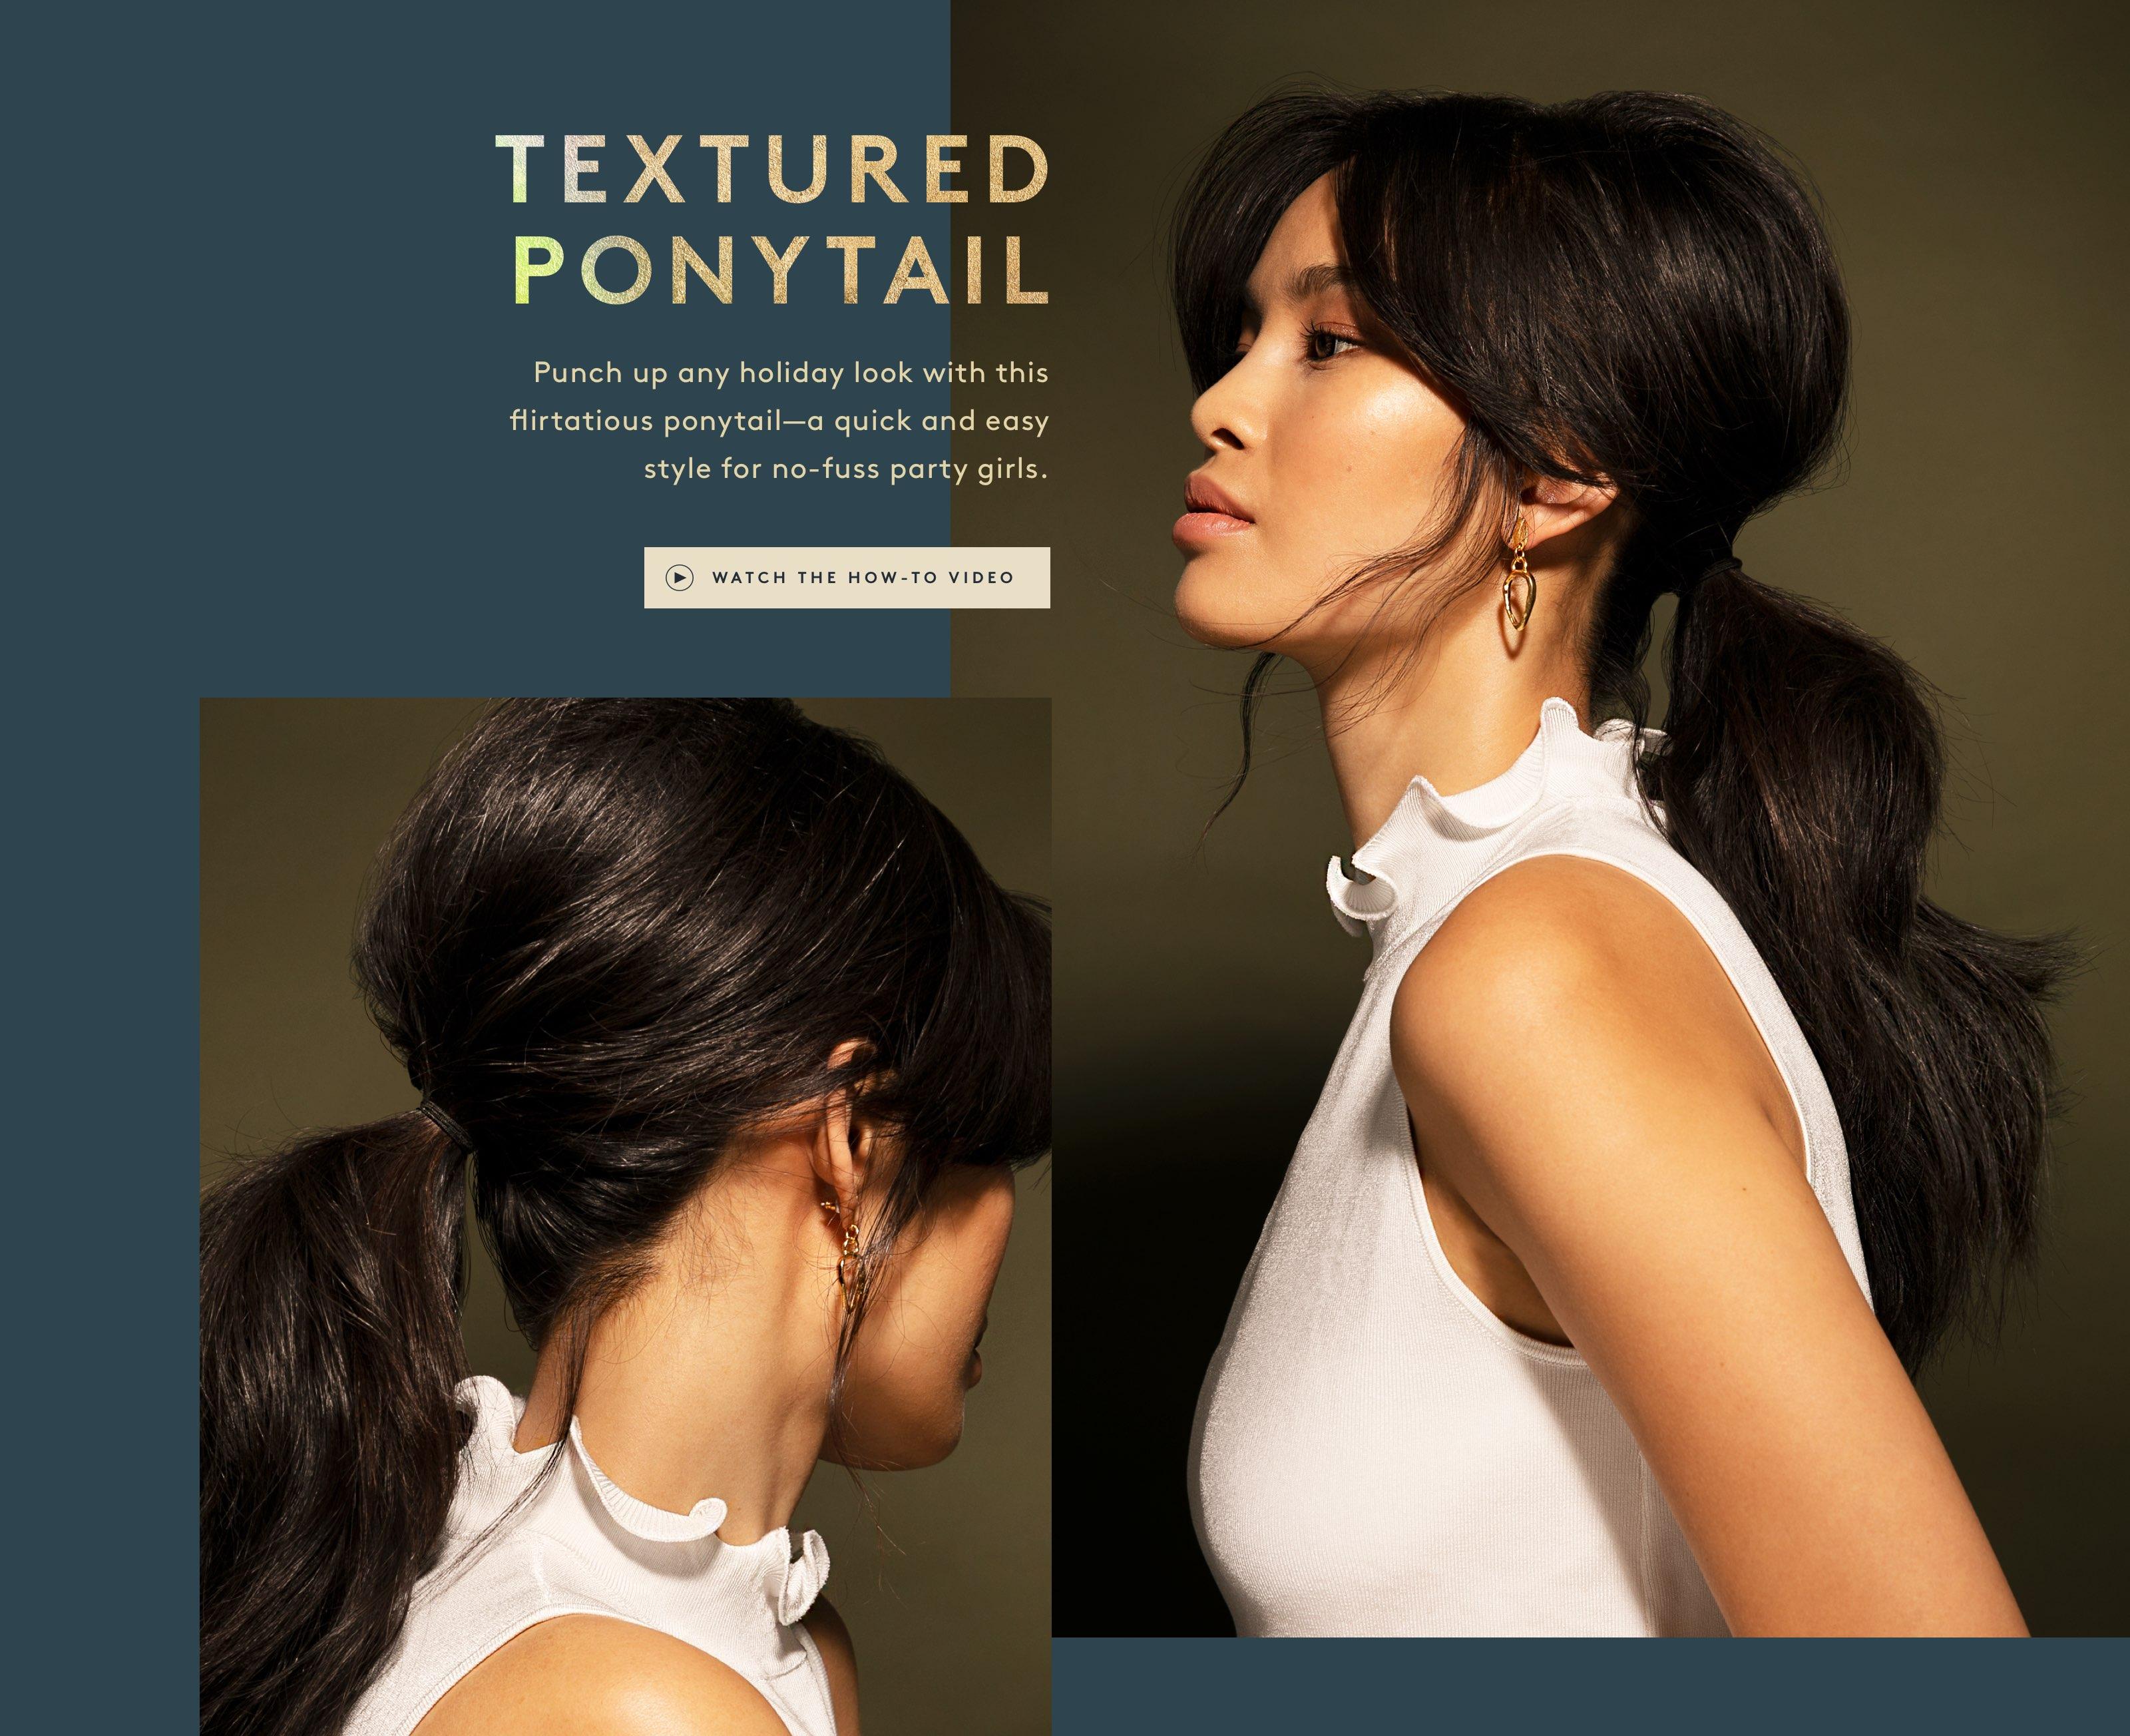 Textured Ponytail